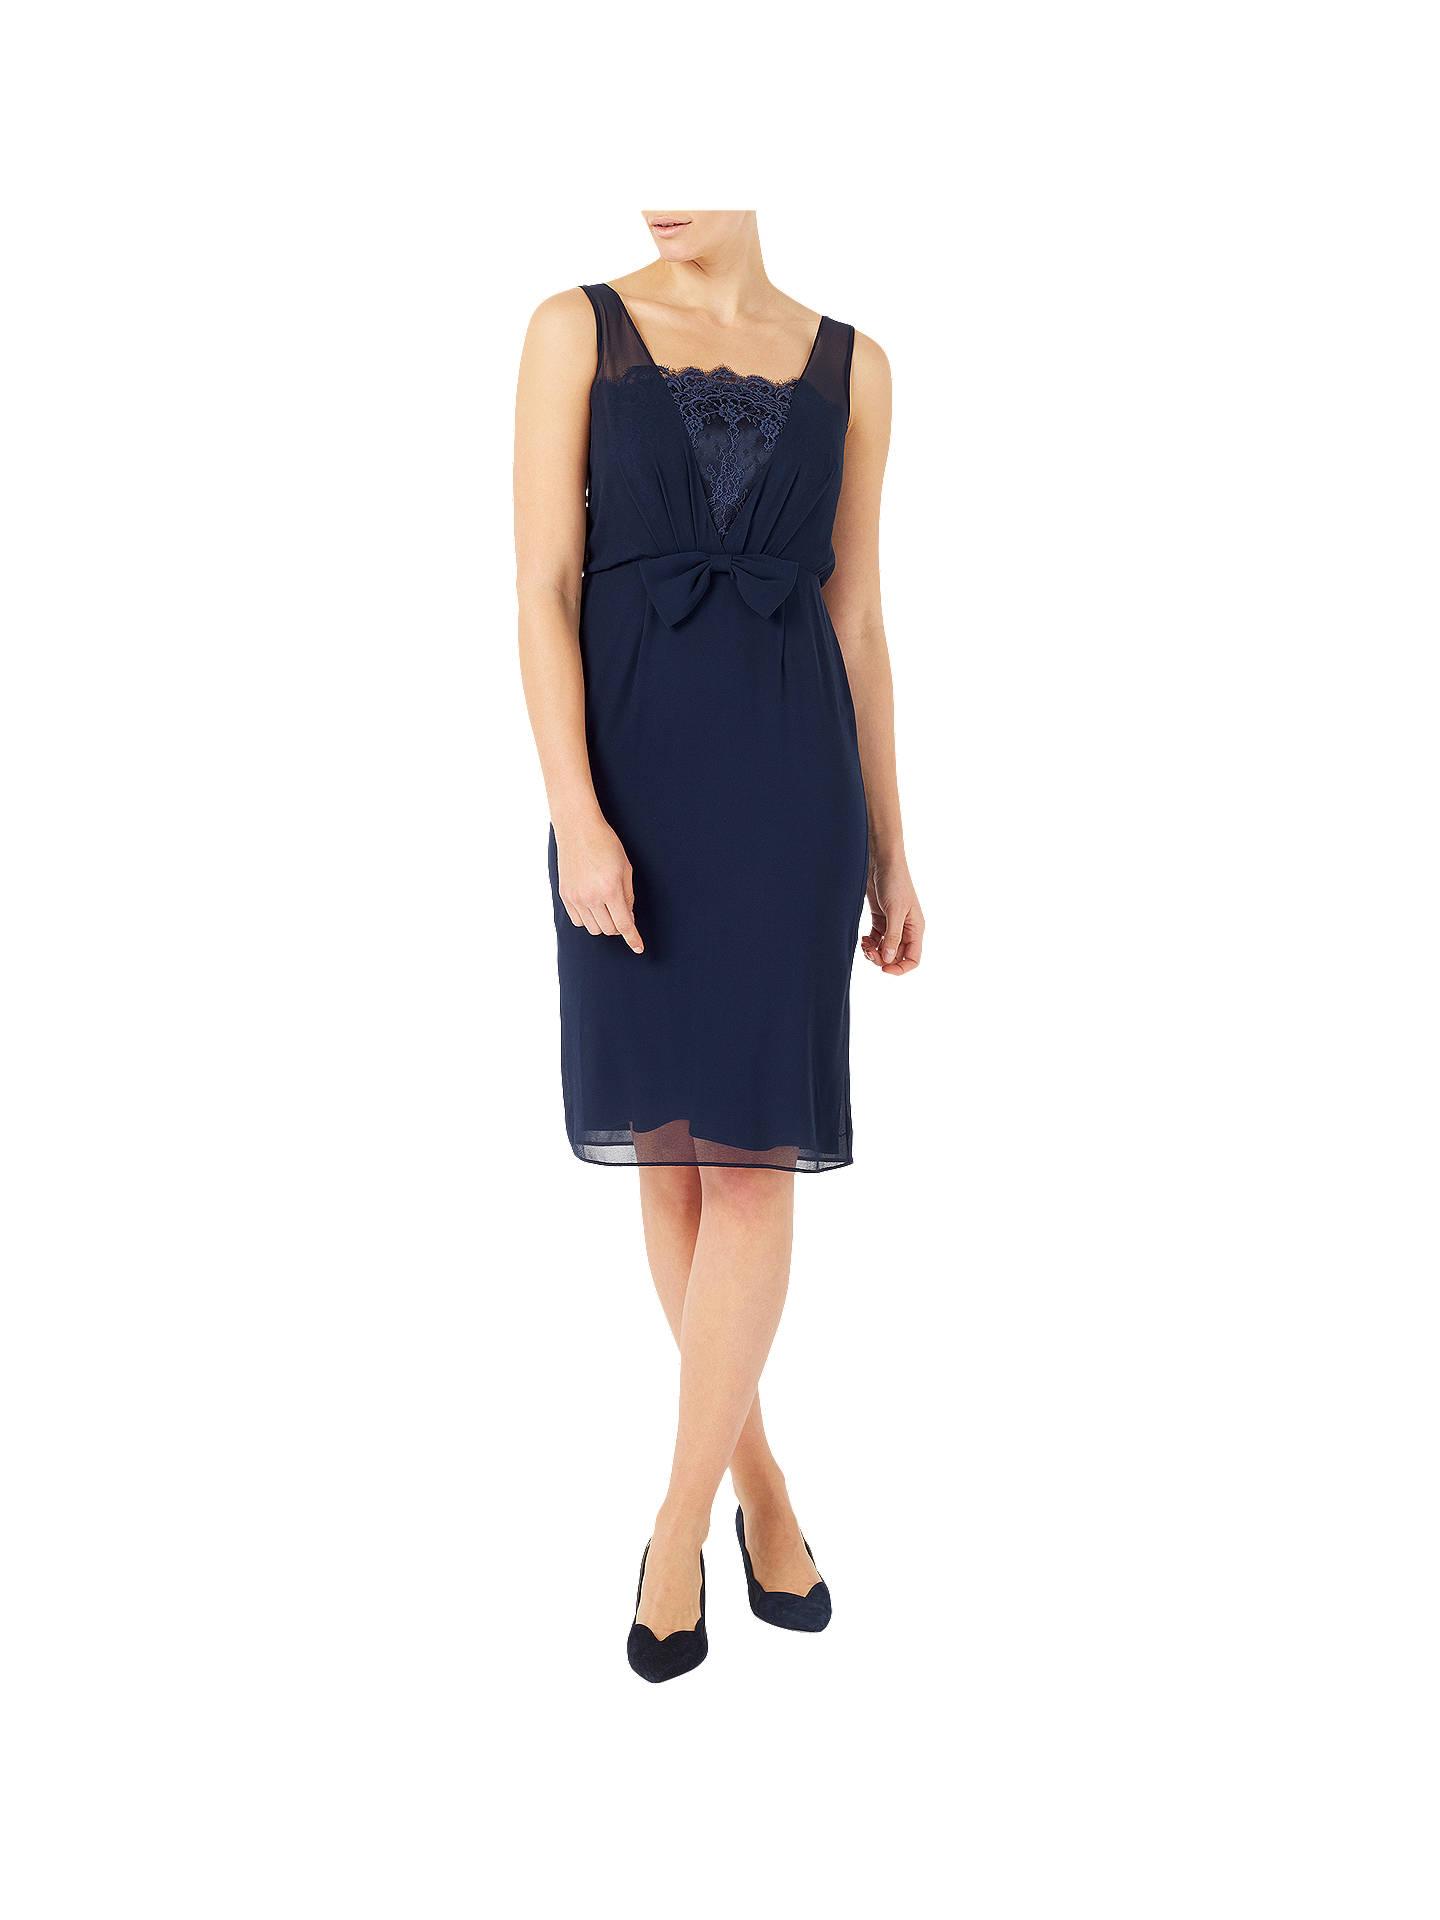 dc8425937025a Buy Jacques Vert Chiffon Lace Trim Dress